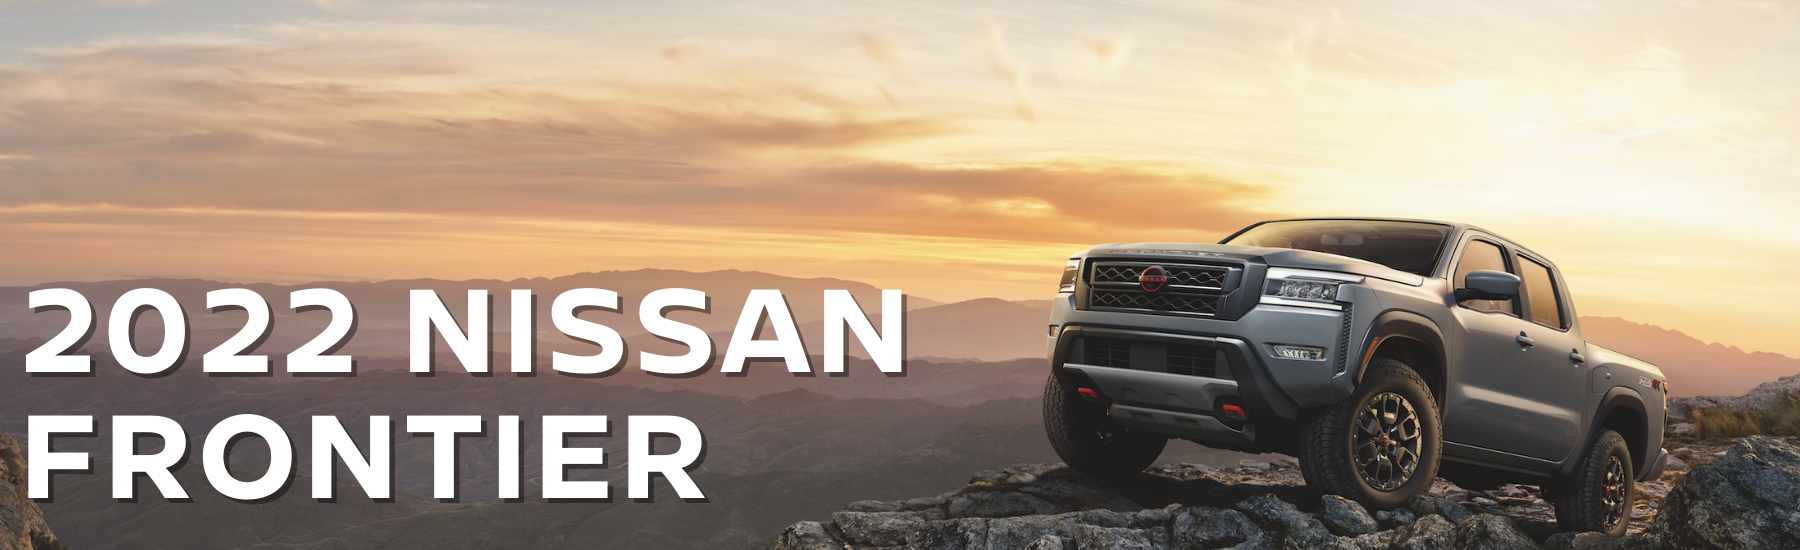 v2RR Nissan Homepage Sept 2021